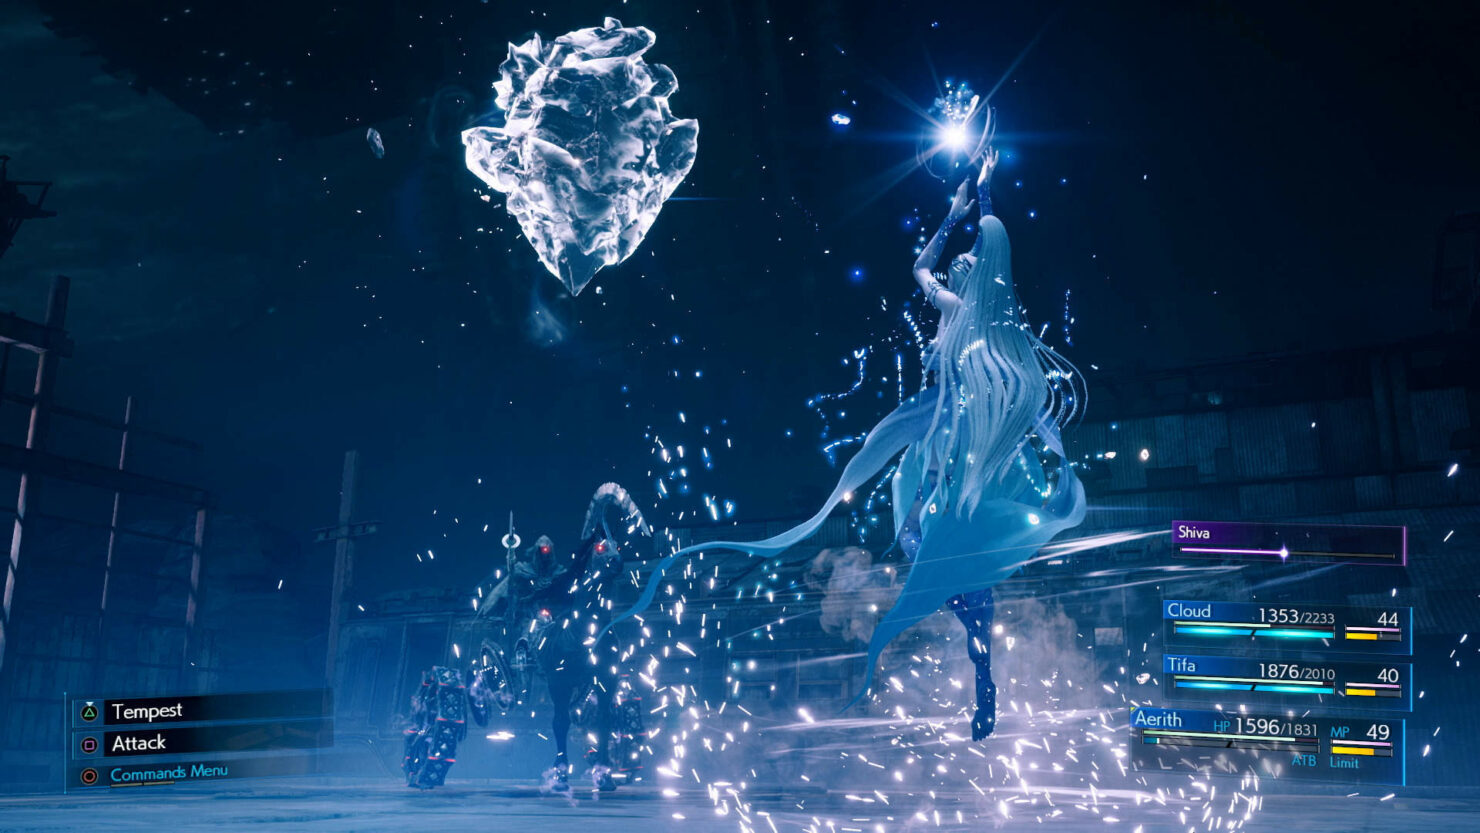 final-fantasy-vii-remake-screenshots-info-4213456